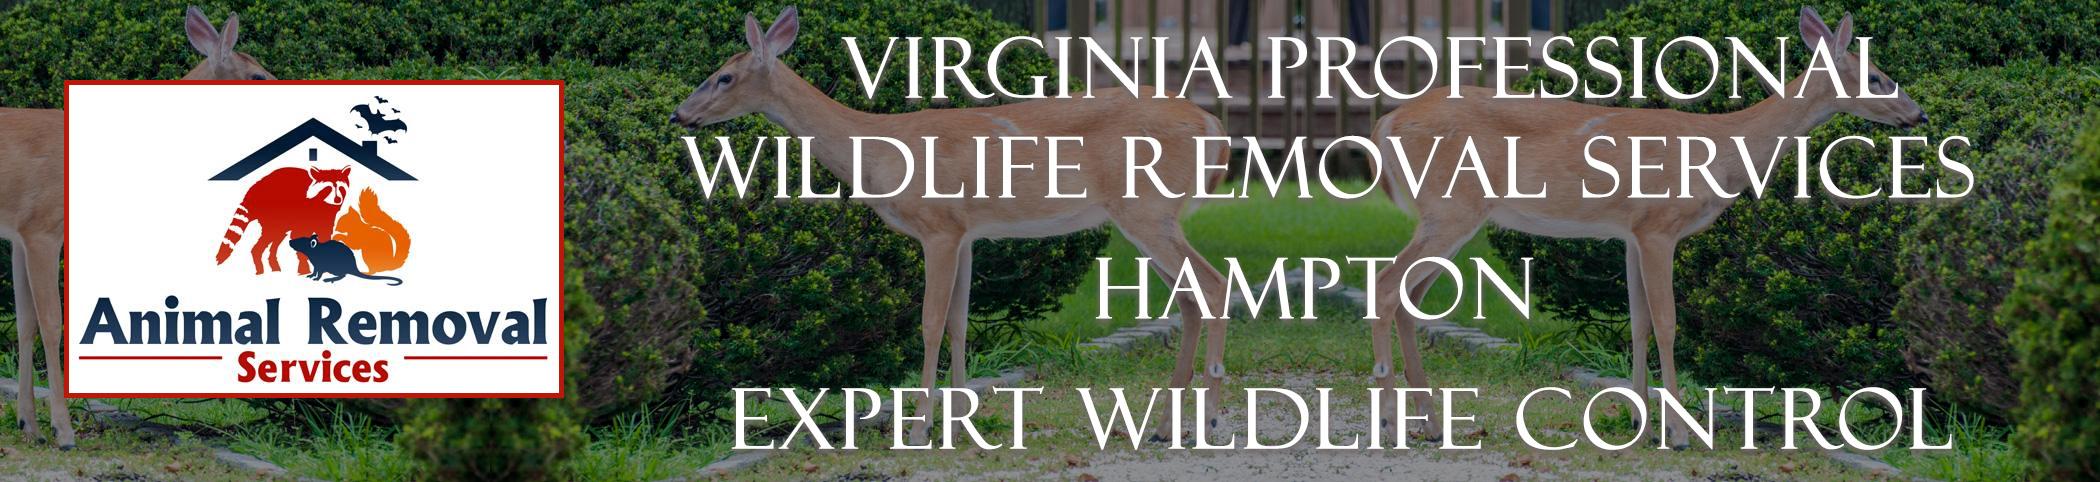 Virginia-Professional-Wildlife-Removal-Services-Hampton